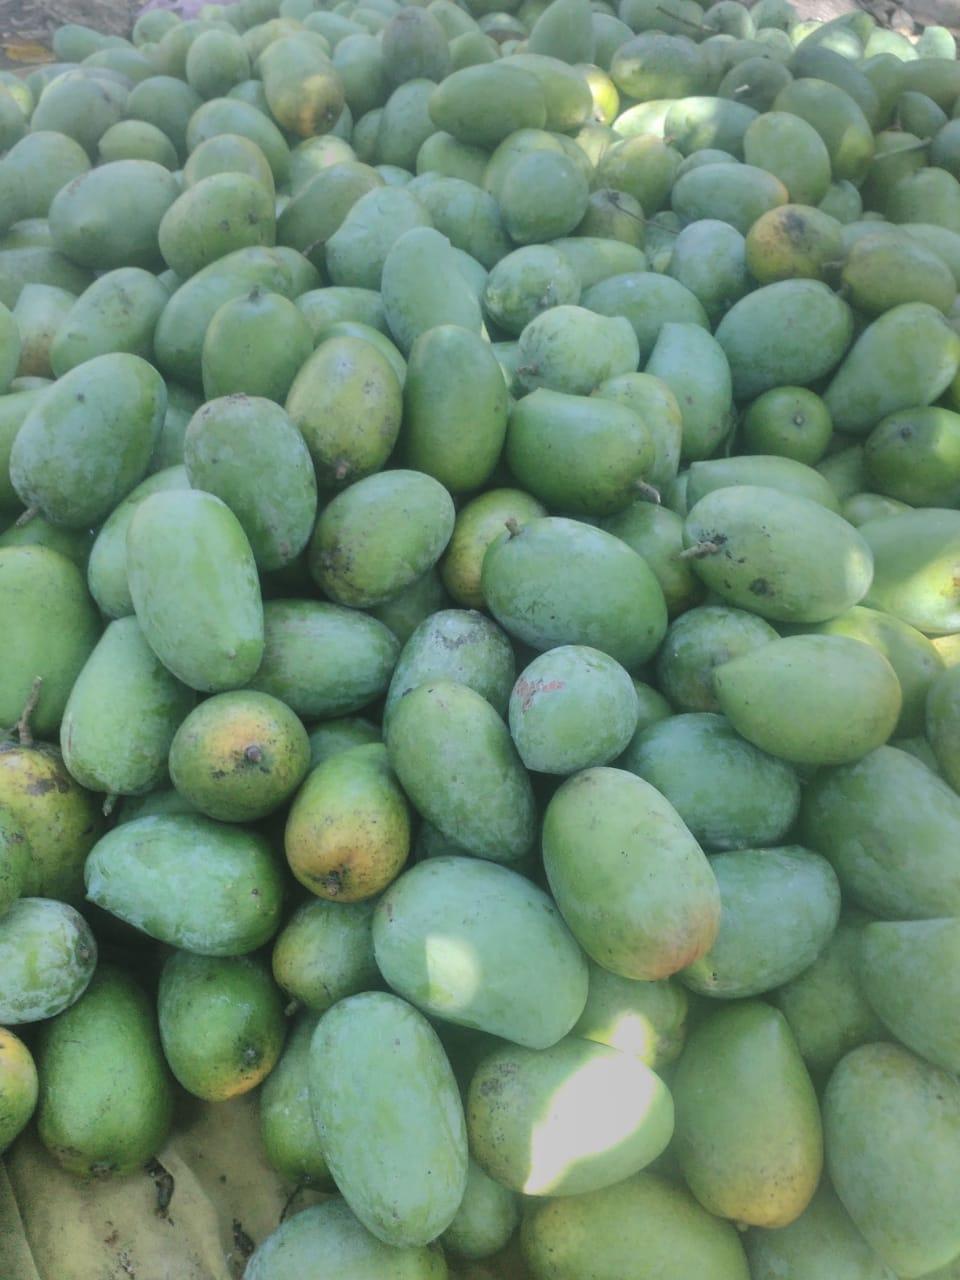 Tasty mangoes